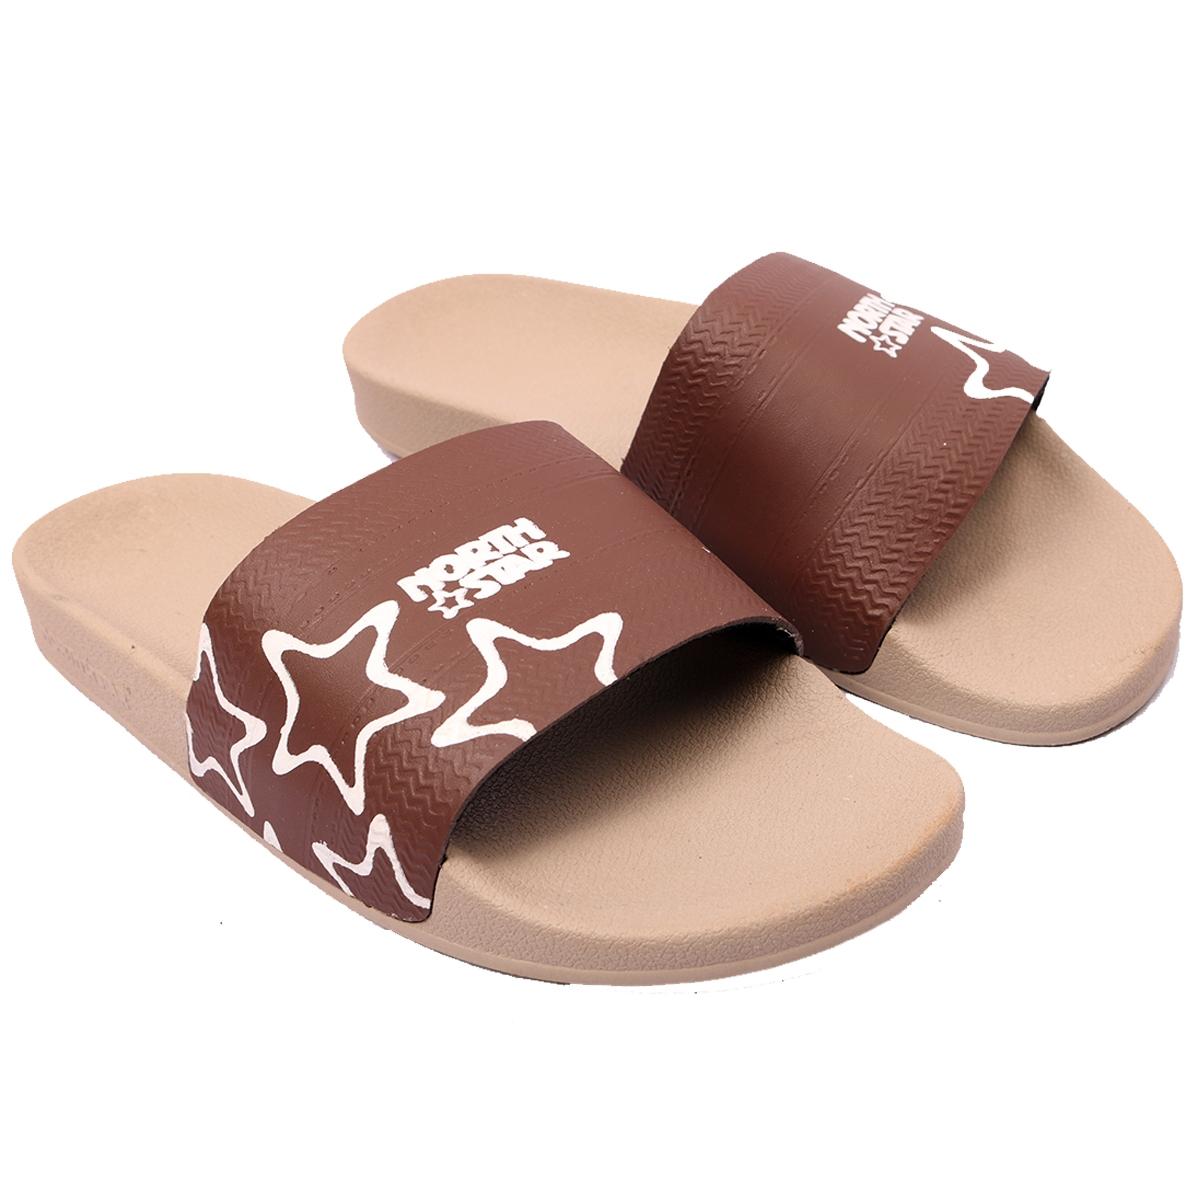 c7d1471470edb BATA Mens Toro Small Stars Brown-Northstar (872-4027) brown 41: Product No:  3159337. Item specifics: Brand: